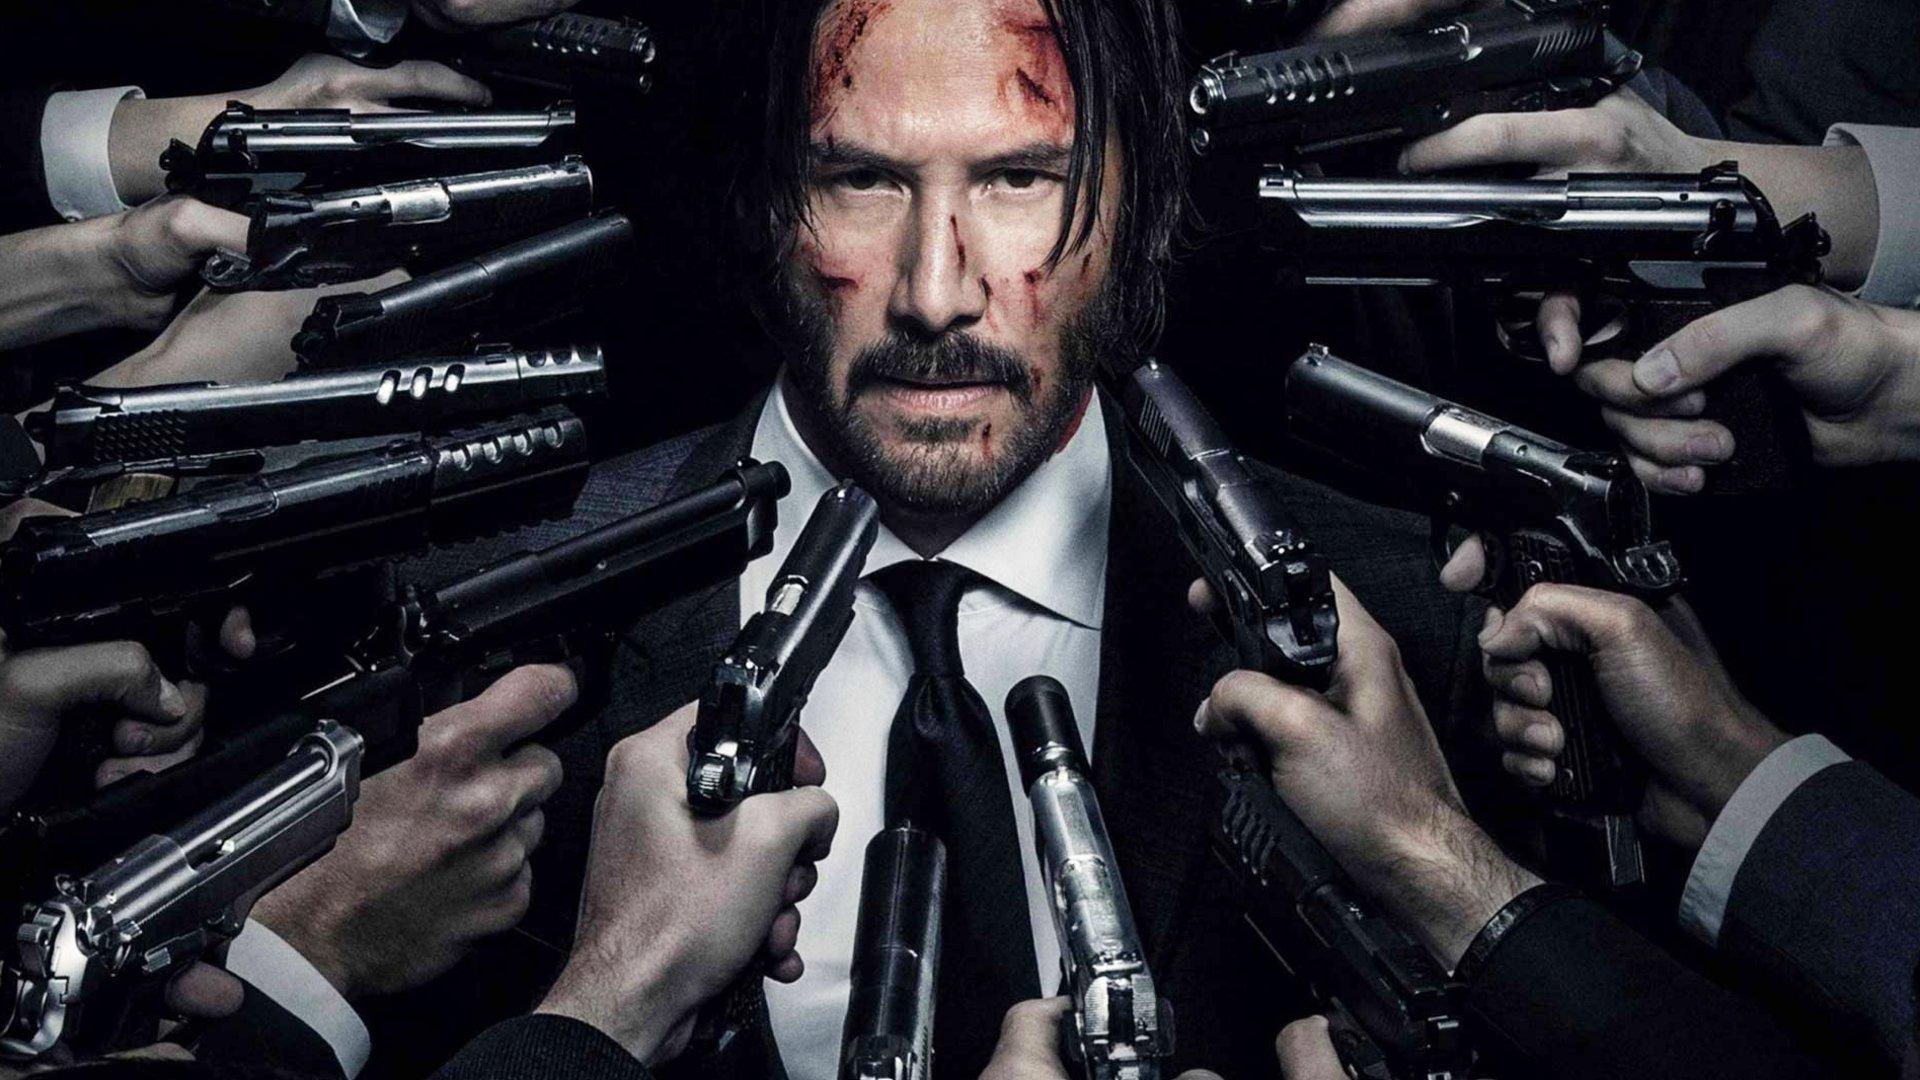 """John Wick 4"": So lange wird Keanu Reeves noch den Superkiller spielen"